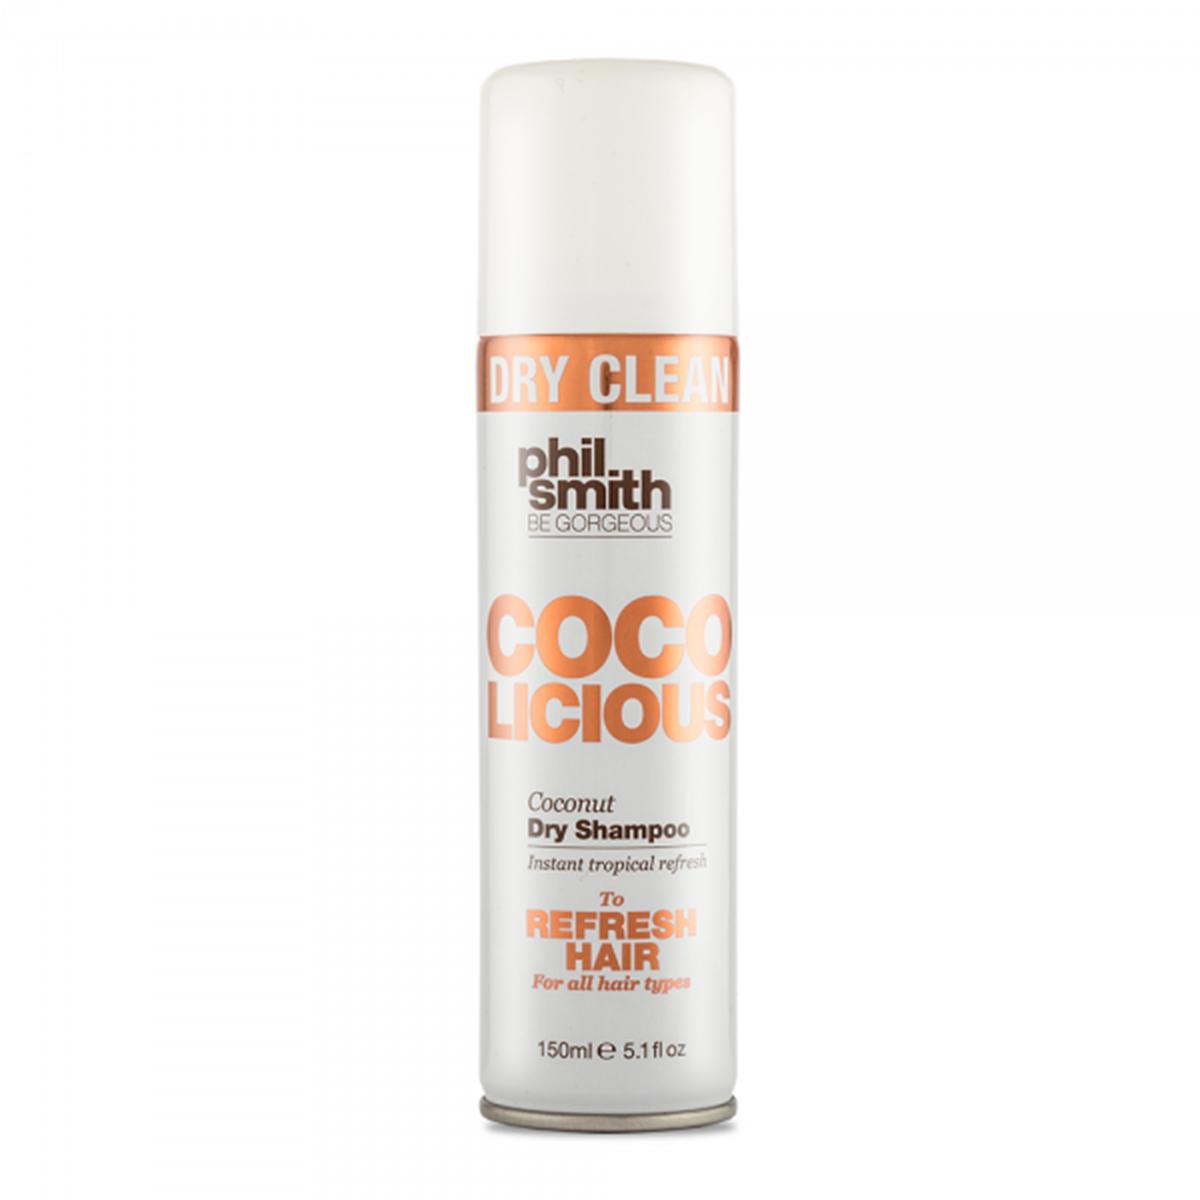 Phil Smith Coco Licious Kuru Şampuan 150 ml